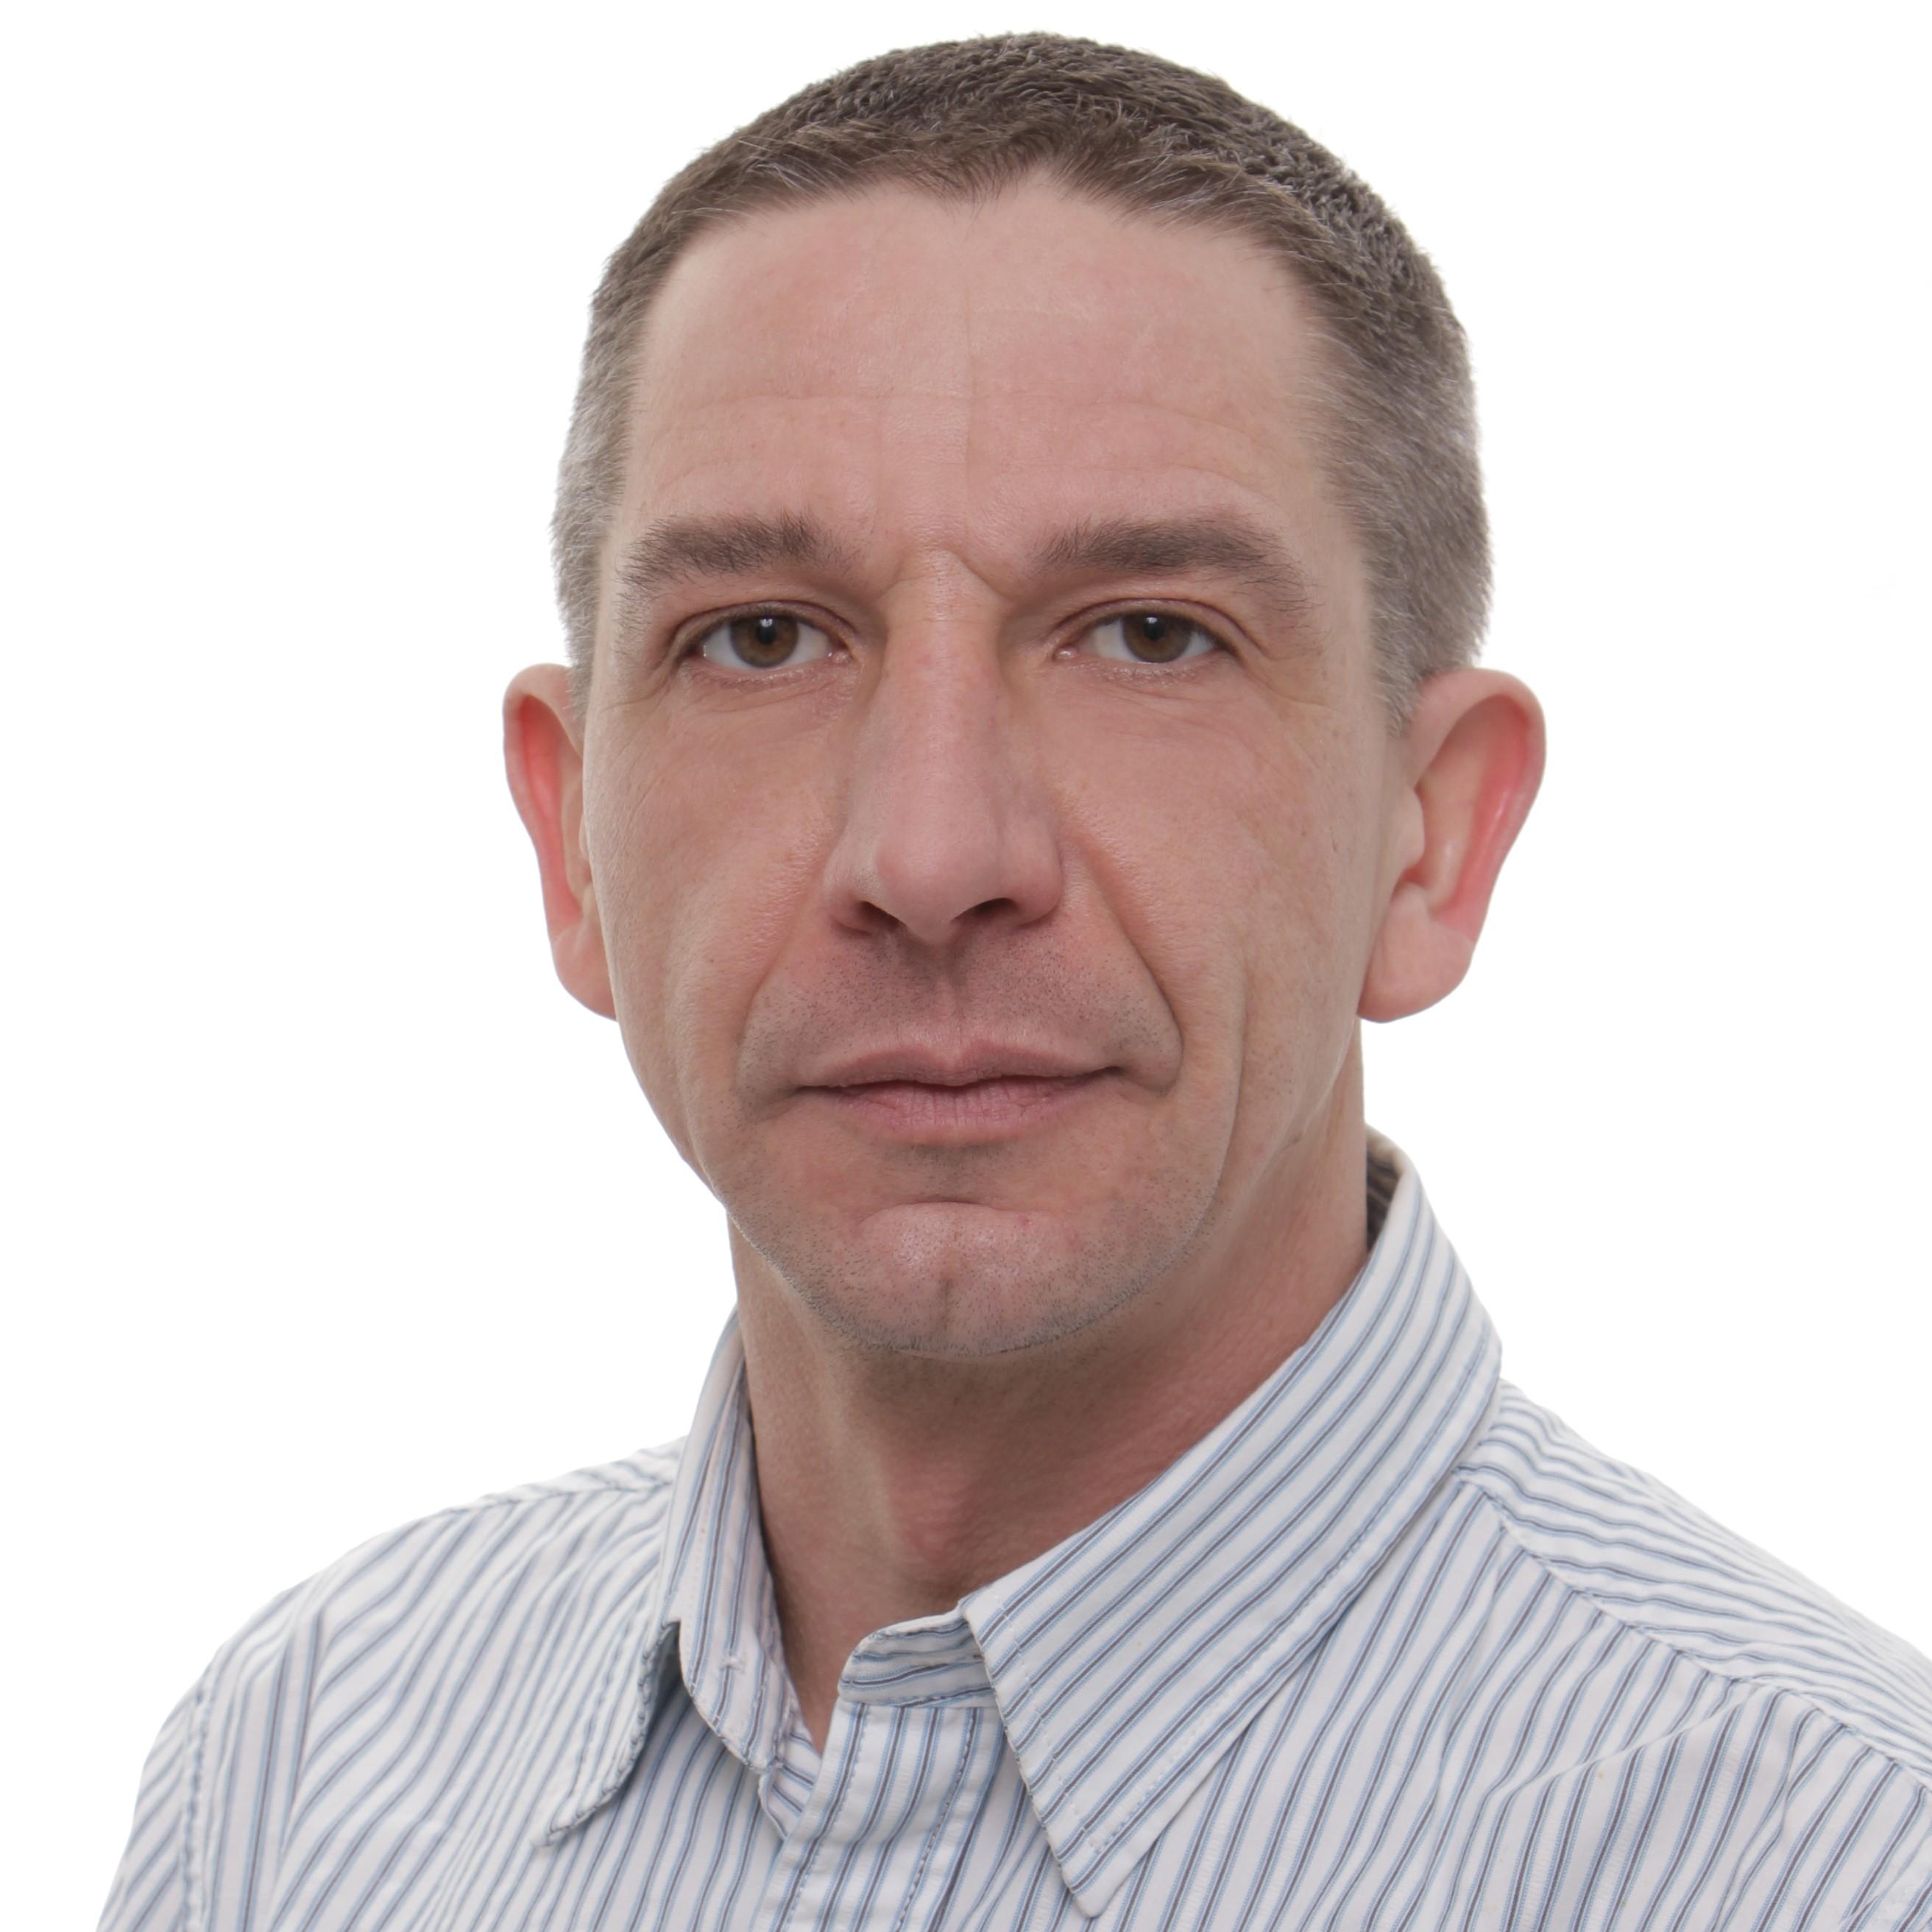 Piotr Stasialovich